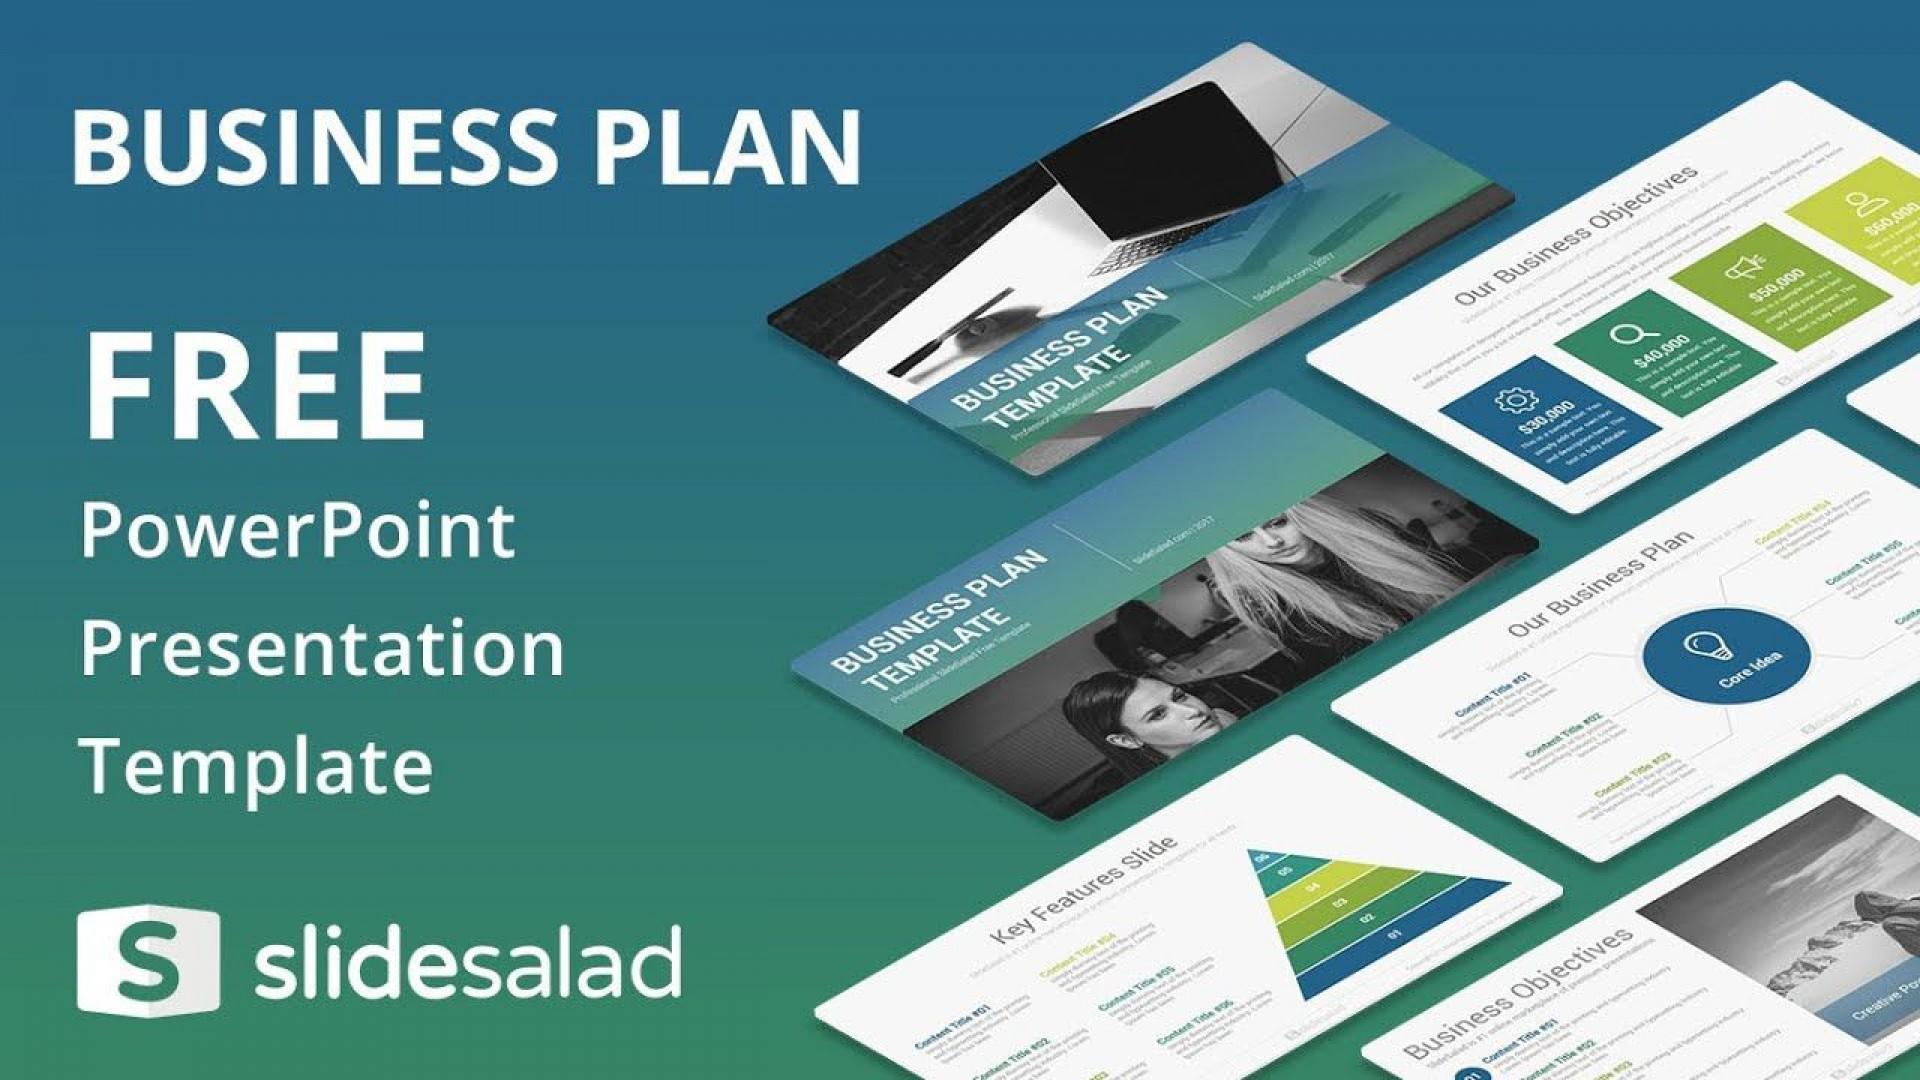 008 Astounding Free Busines Proposal Template Powerpoint Idea  Best Plan Ppt 2020 Sale1920